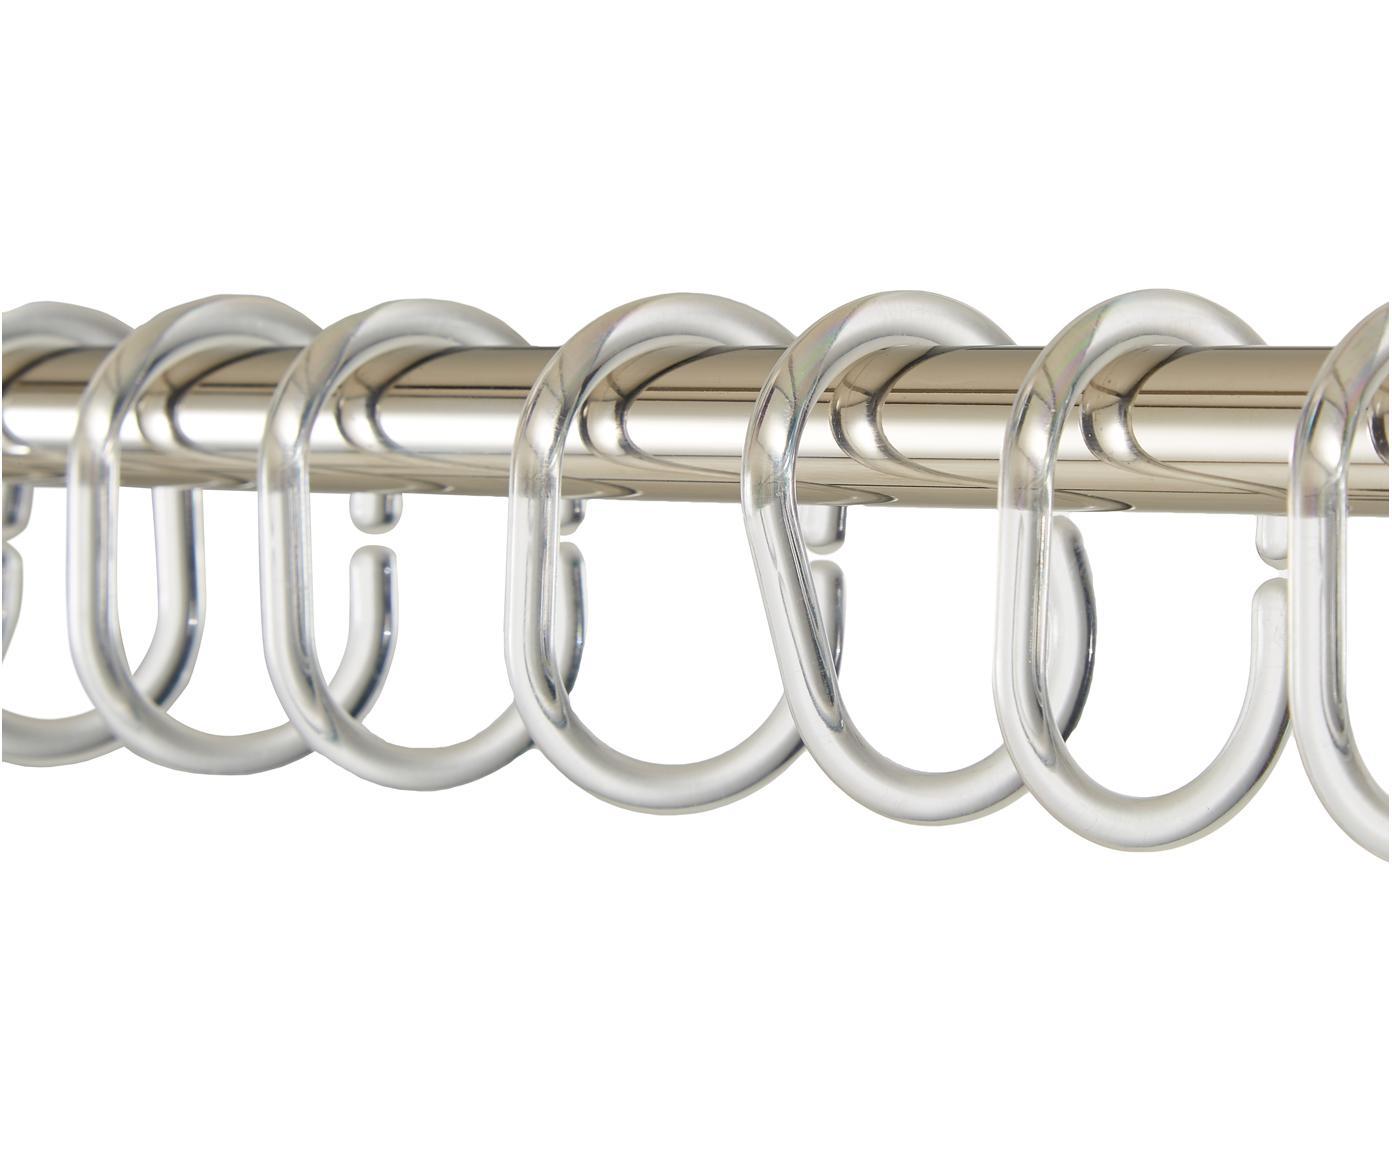 Douchegordijnen ringen Crystal, 12 stuks, Kunststof, Transparant, H 7 cm